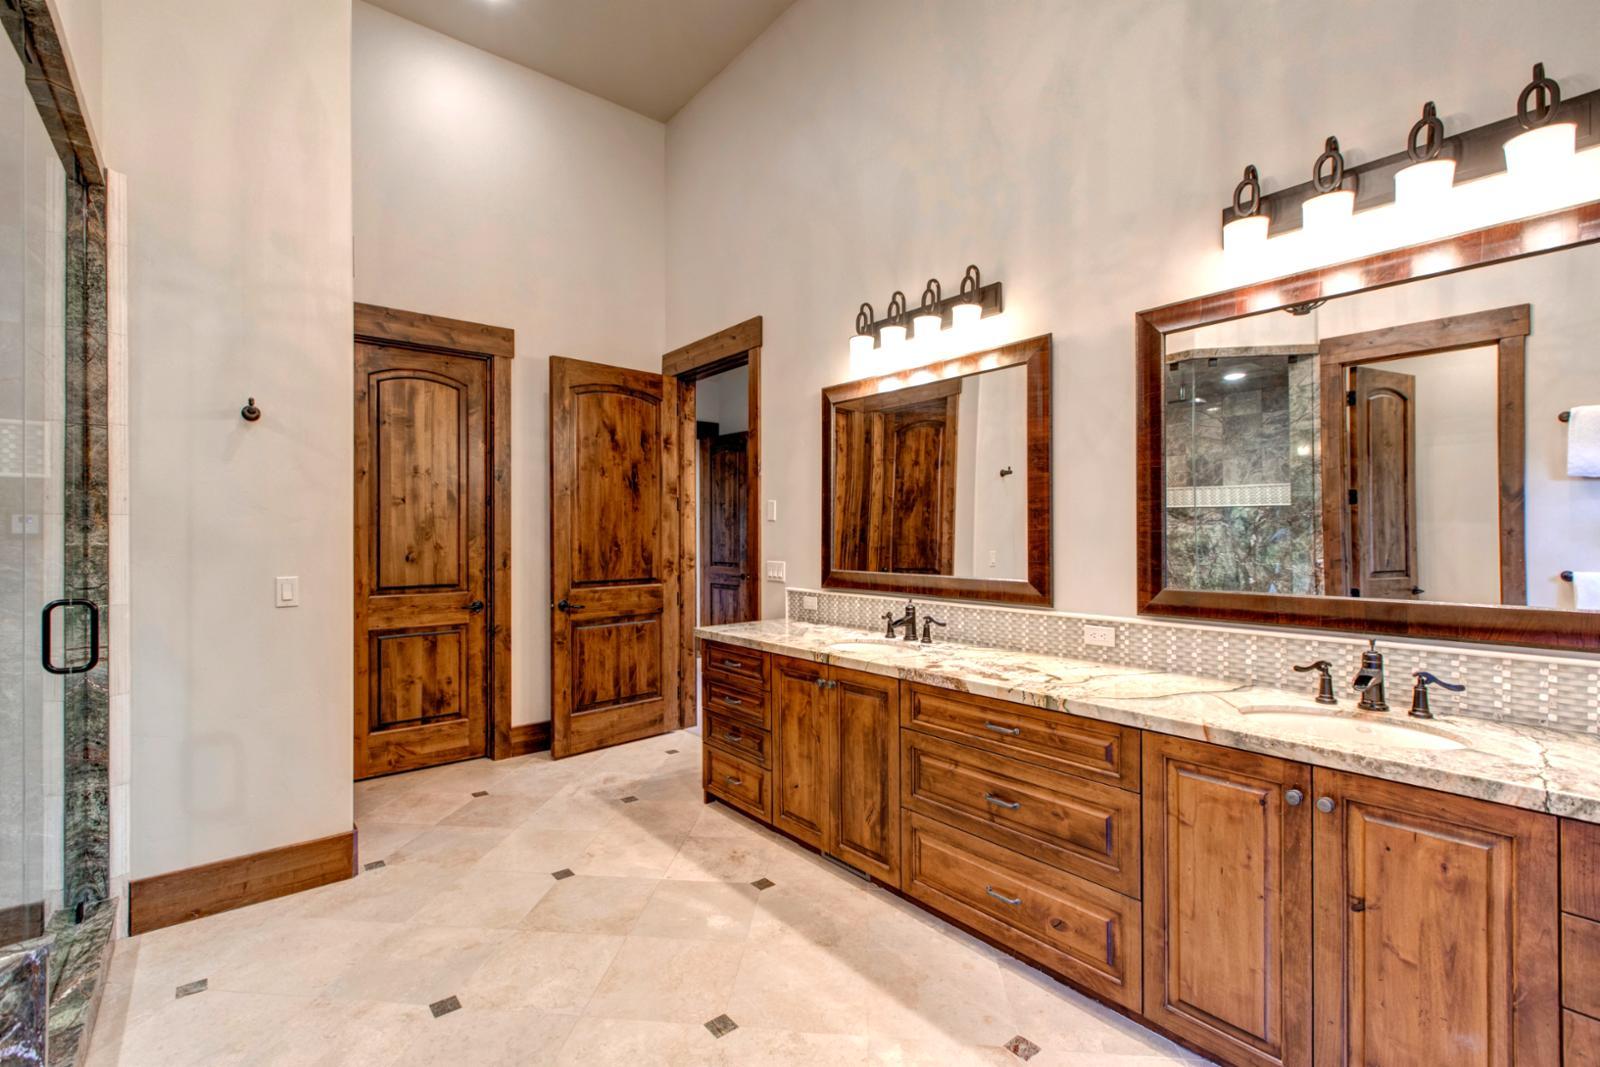 Enjoy the master bathroom encased with unique granite